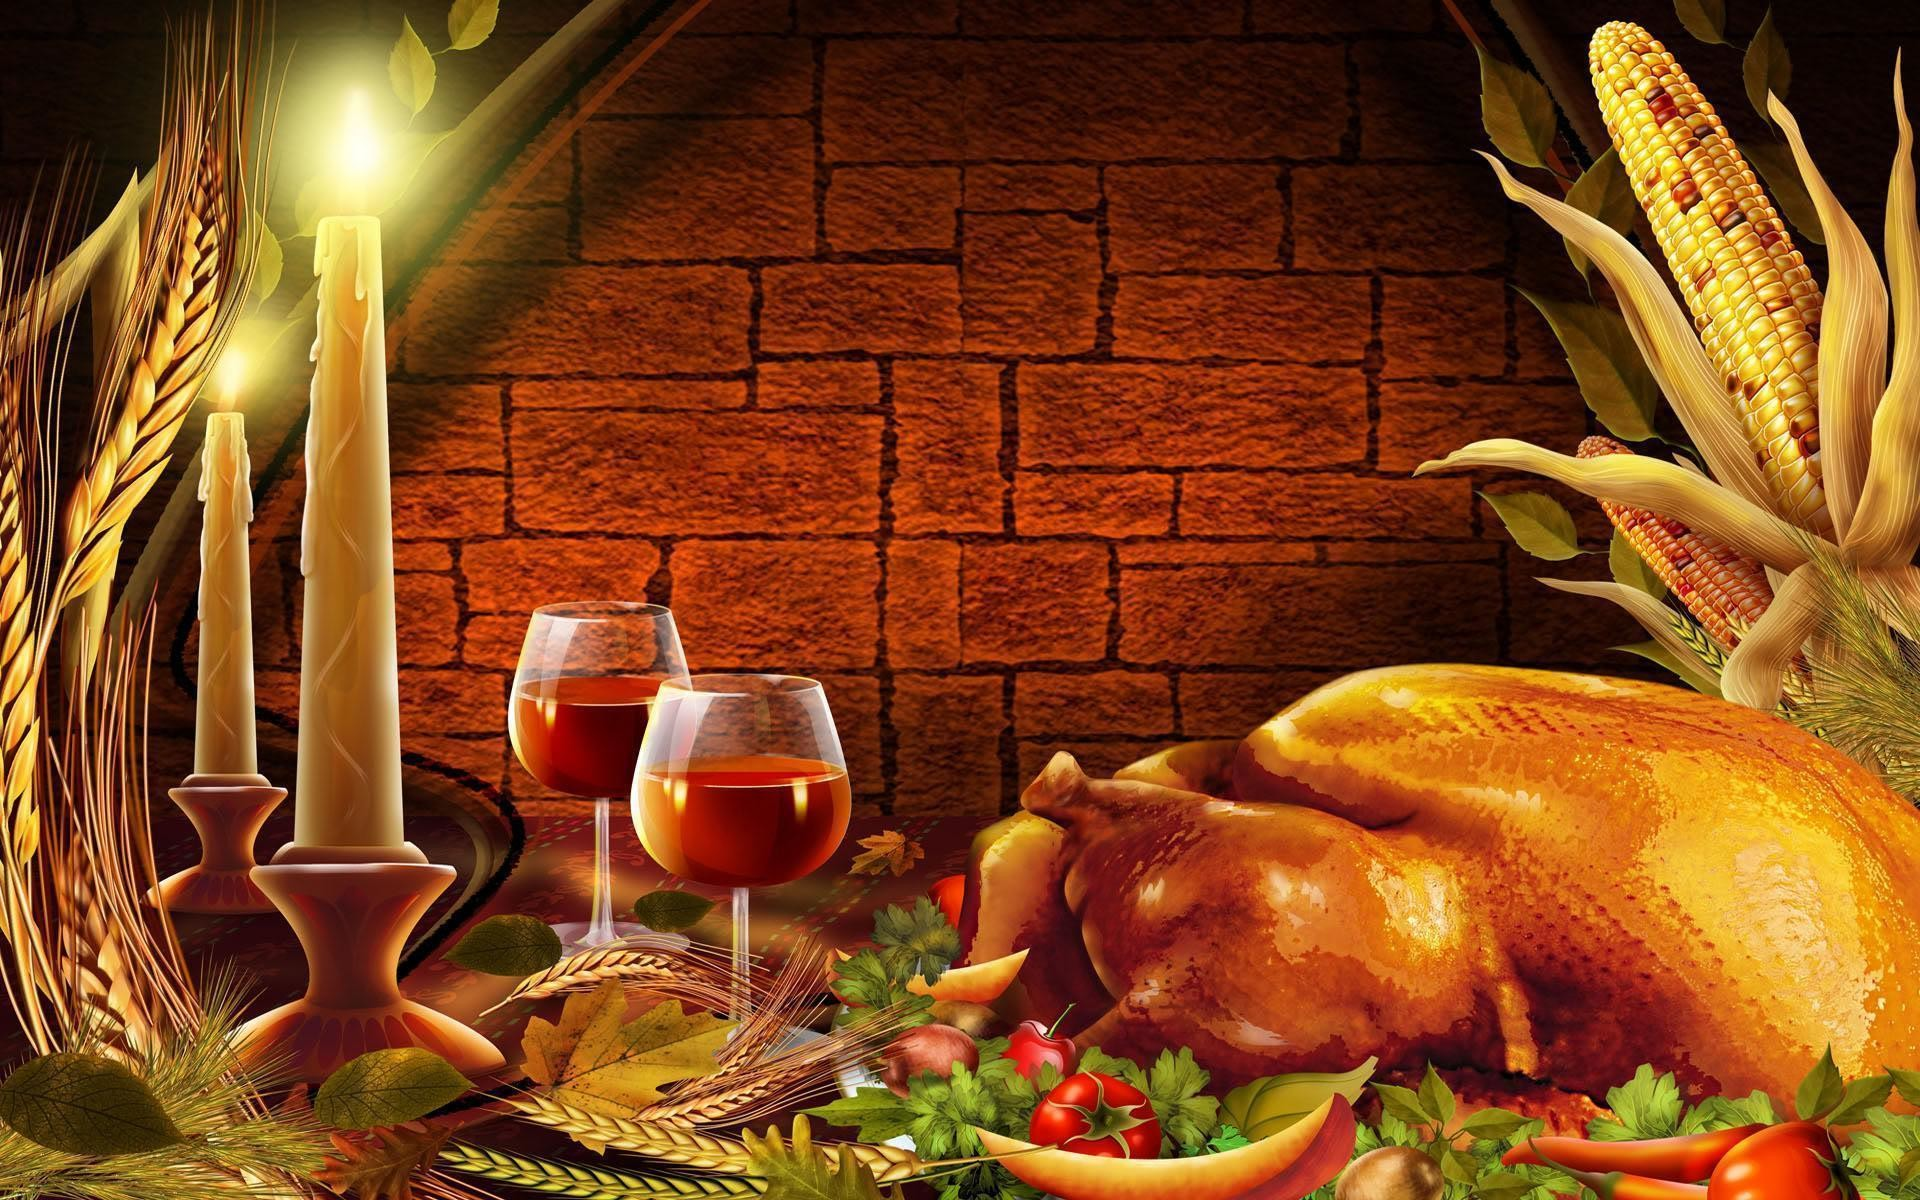 Free Desktop Backgrounds Thanksgiving Wallpaper